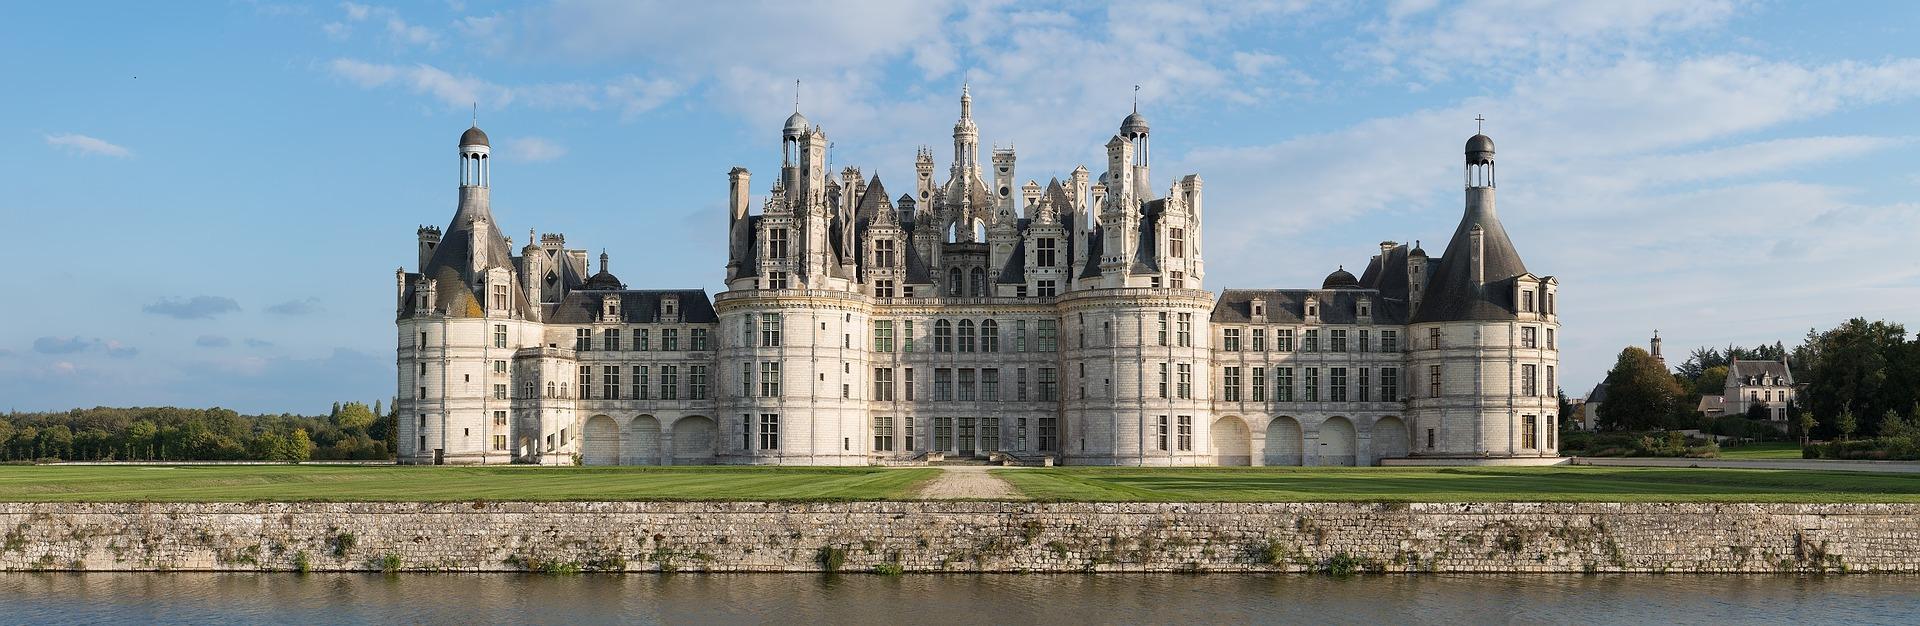 chateau-chambord.jpg